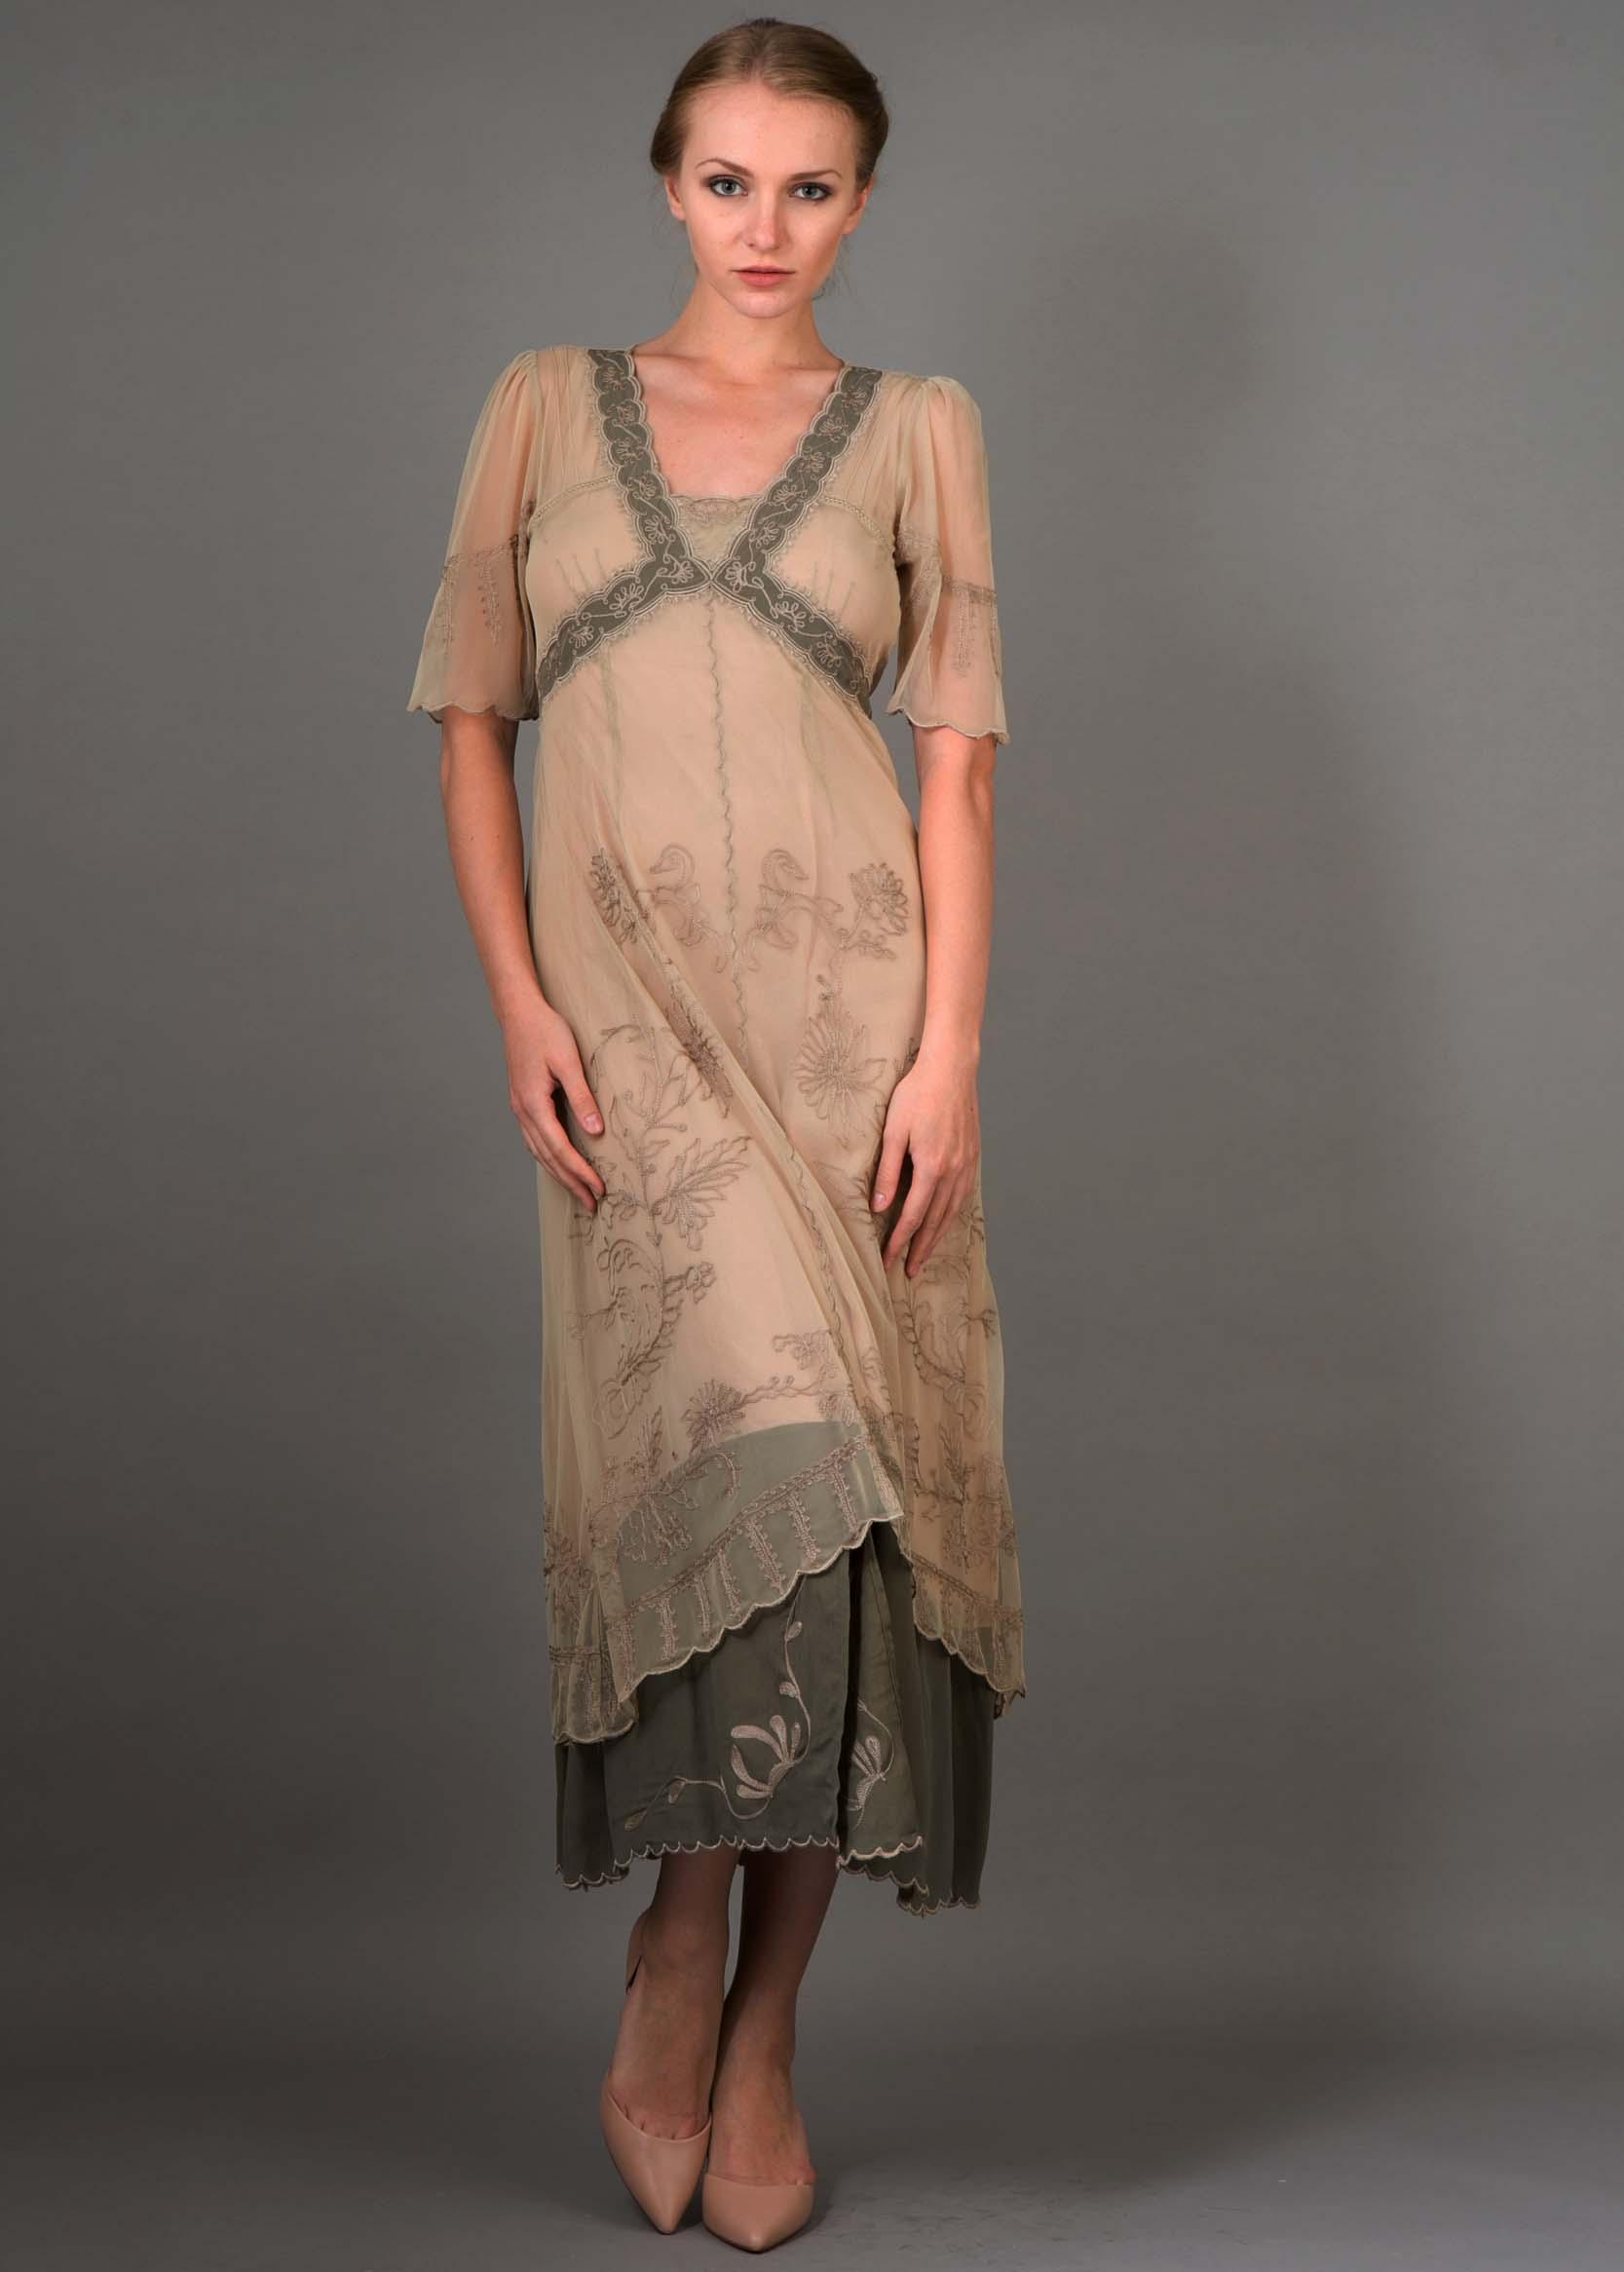 The dress for sale - Nataya Titanic Dress 40007 In Sage